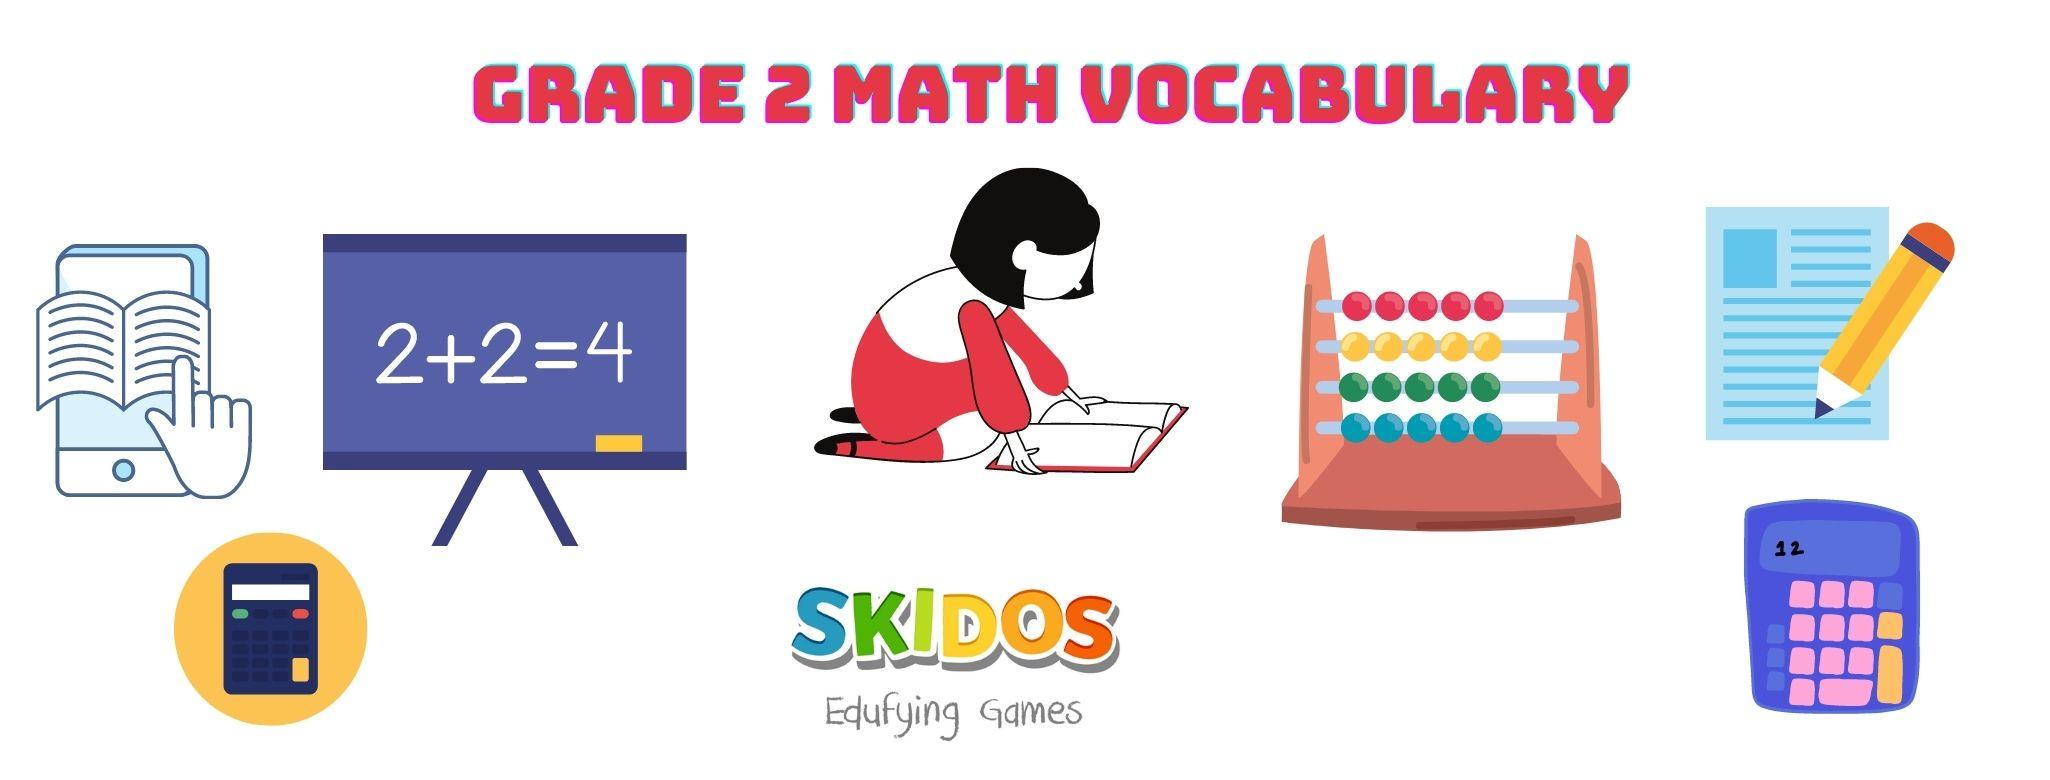 Grade 2 Math Vocabulary: Definition & Simple Explanation